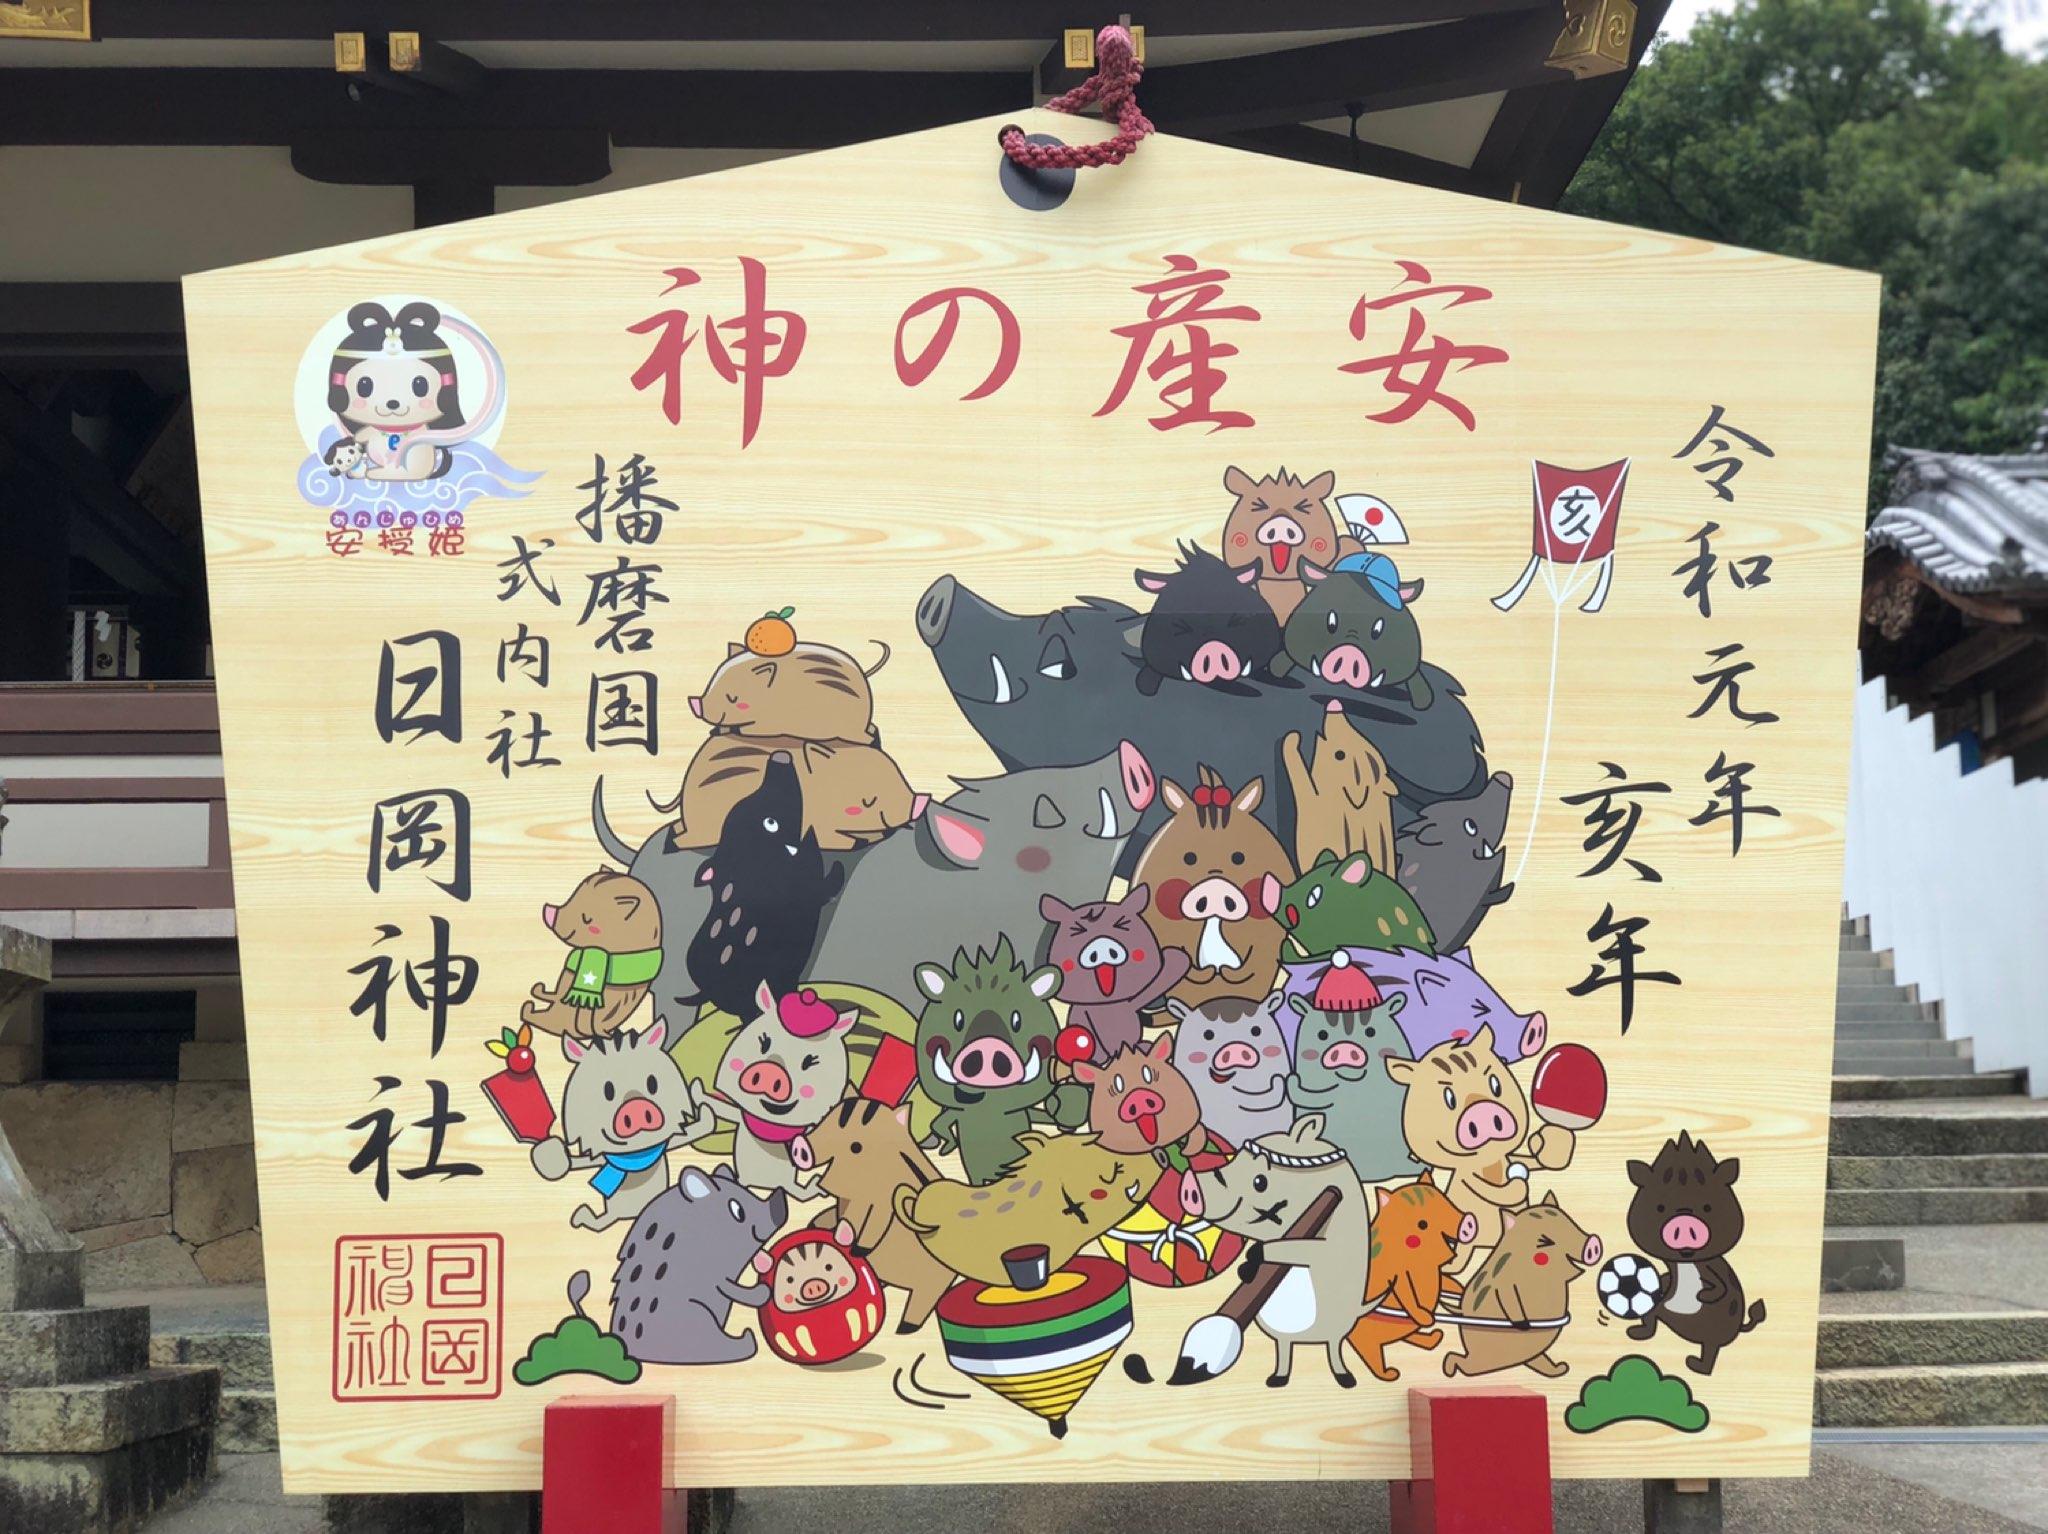 http://www.fujita-yakkyoku.com/area/27F3911E-7DC3-45D9-BA6B-2CDCF5DF7E47.jpg